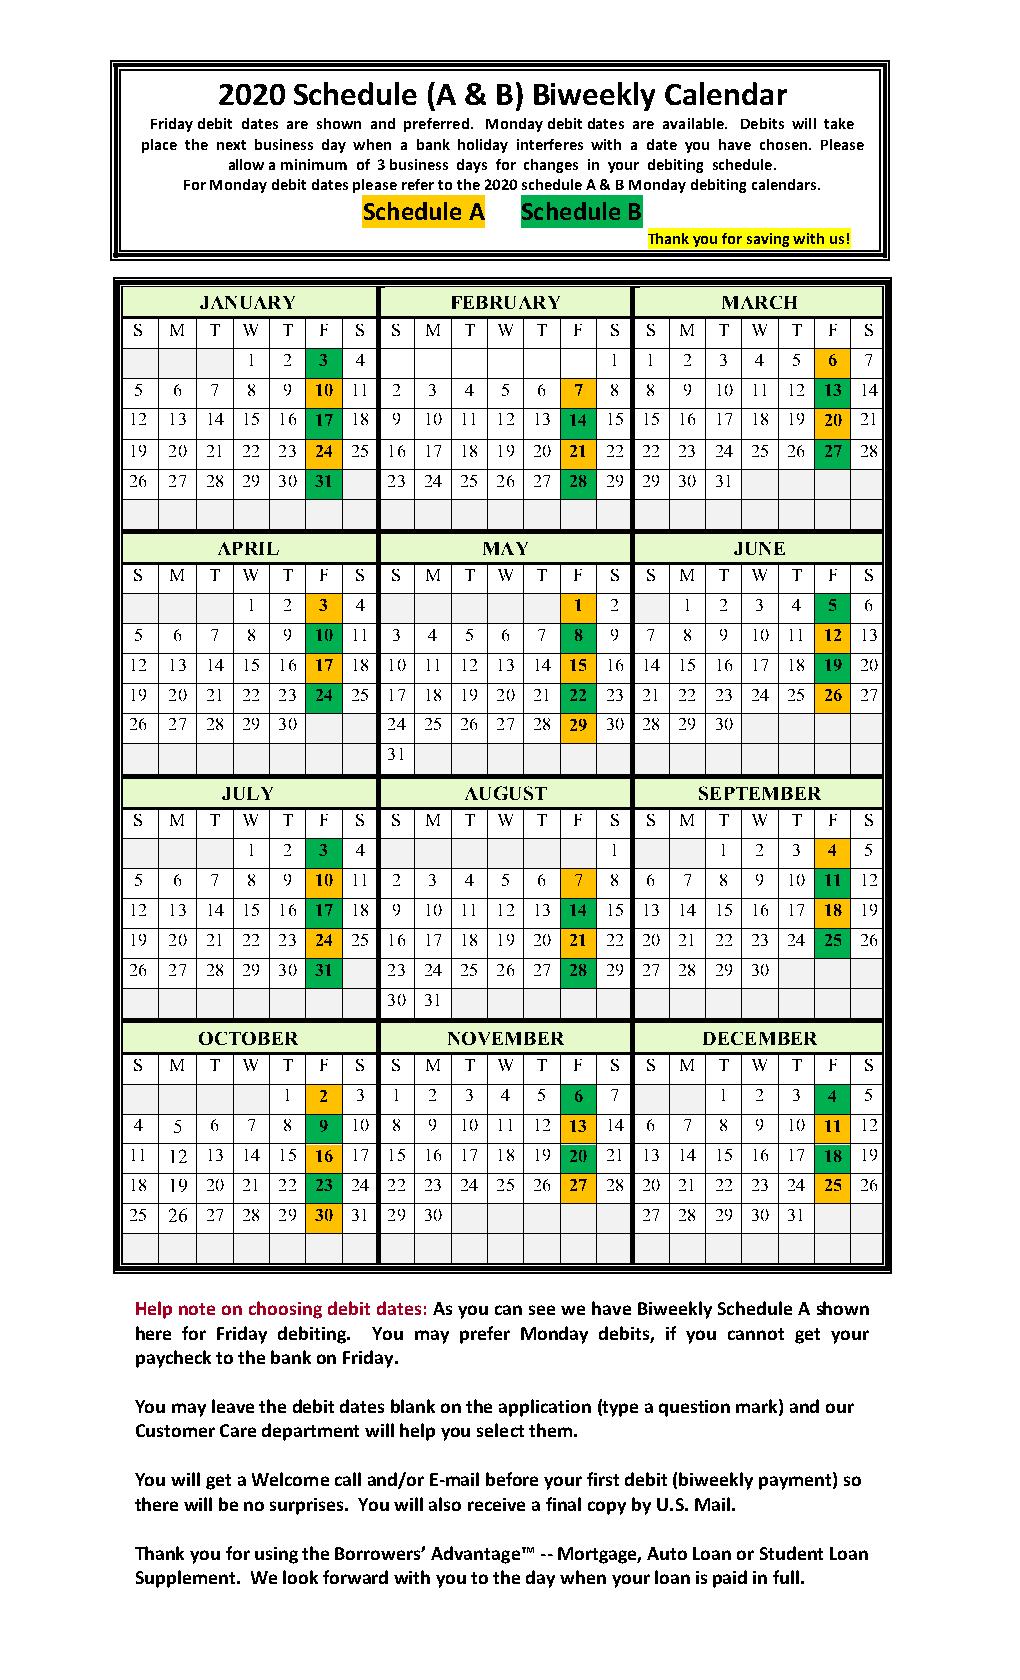 Biweekly Calendars - Smart Biweekly